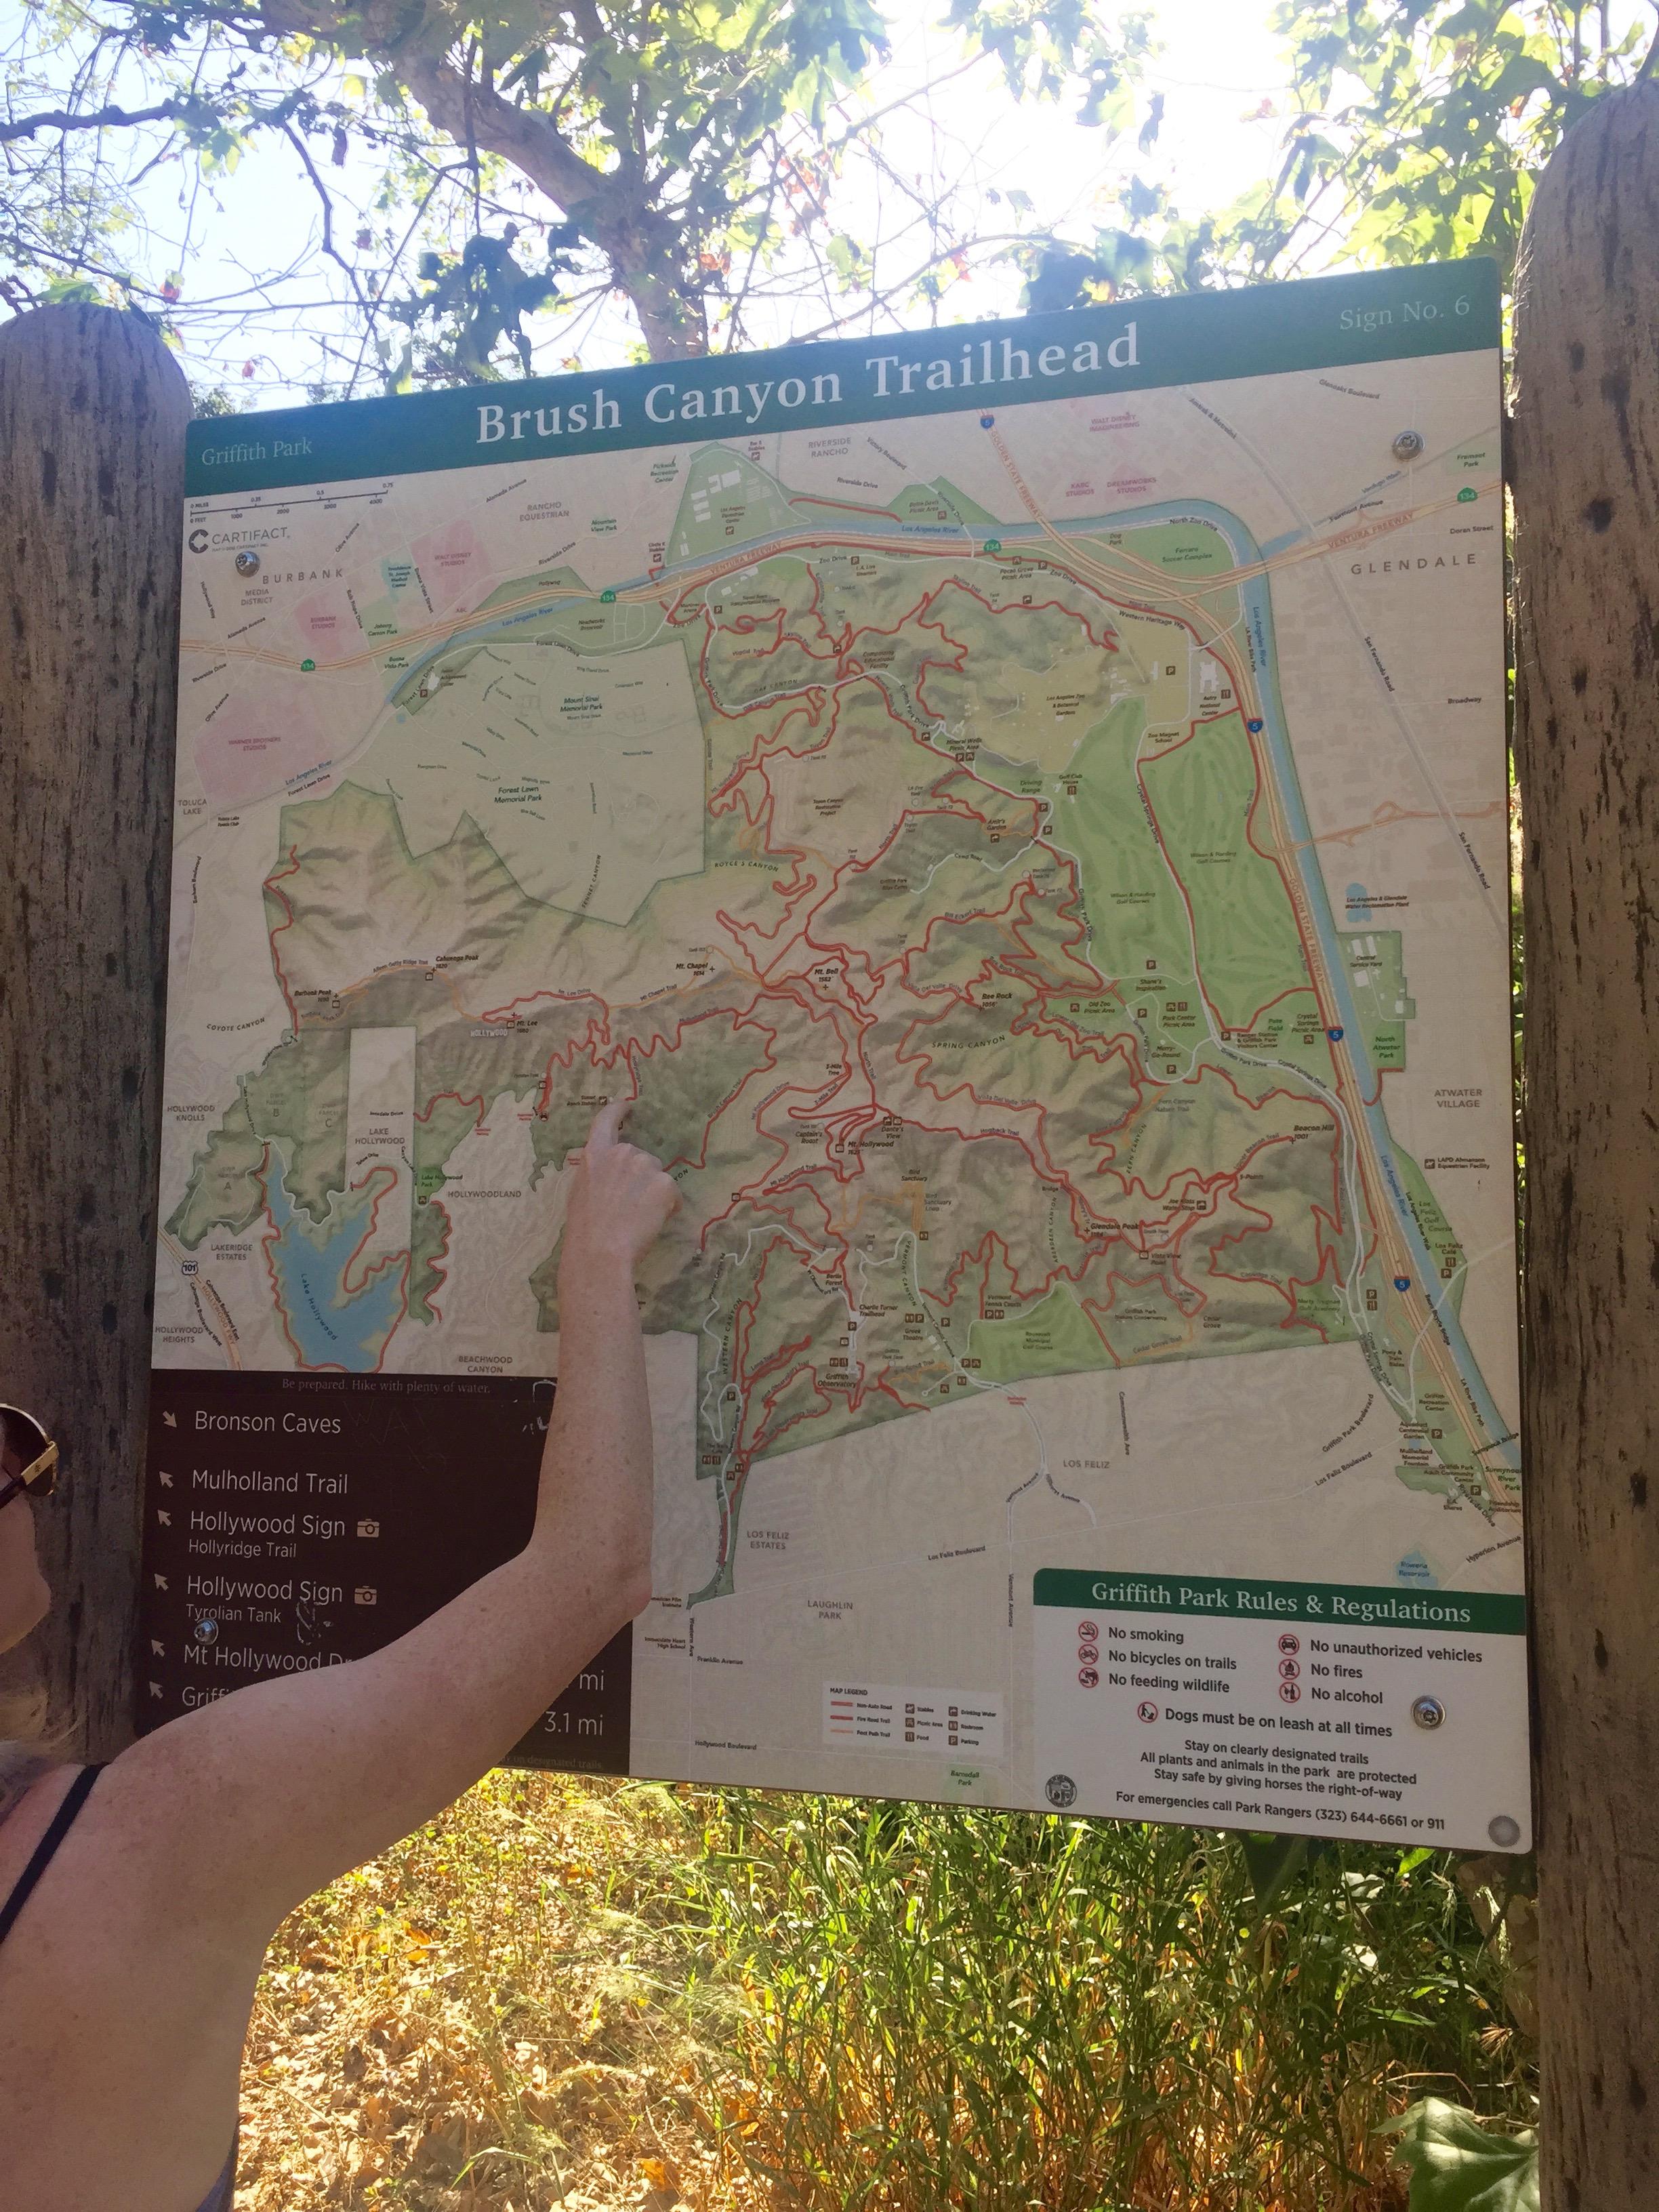 The Trailhead Sign